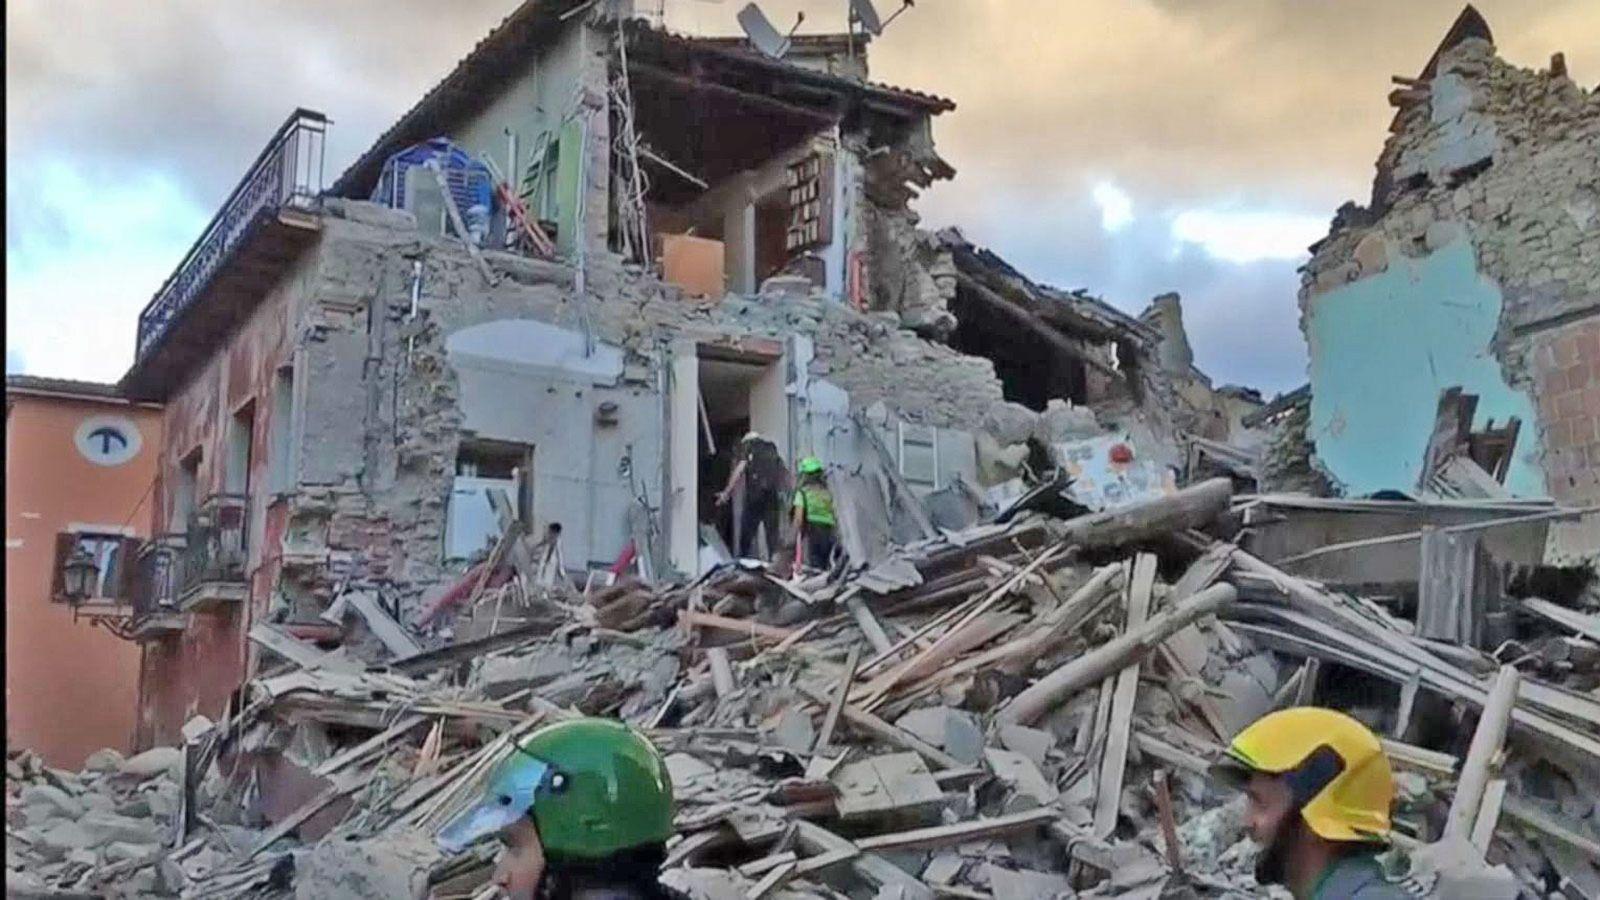 VIDEO: Earthquake Strikes Central Italy, Dozens Killed